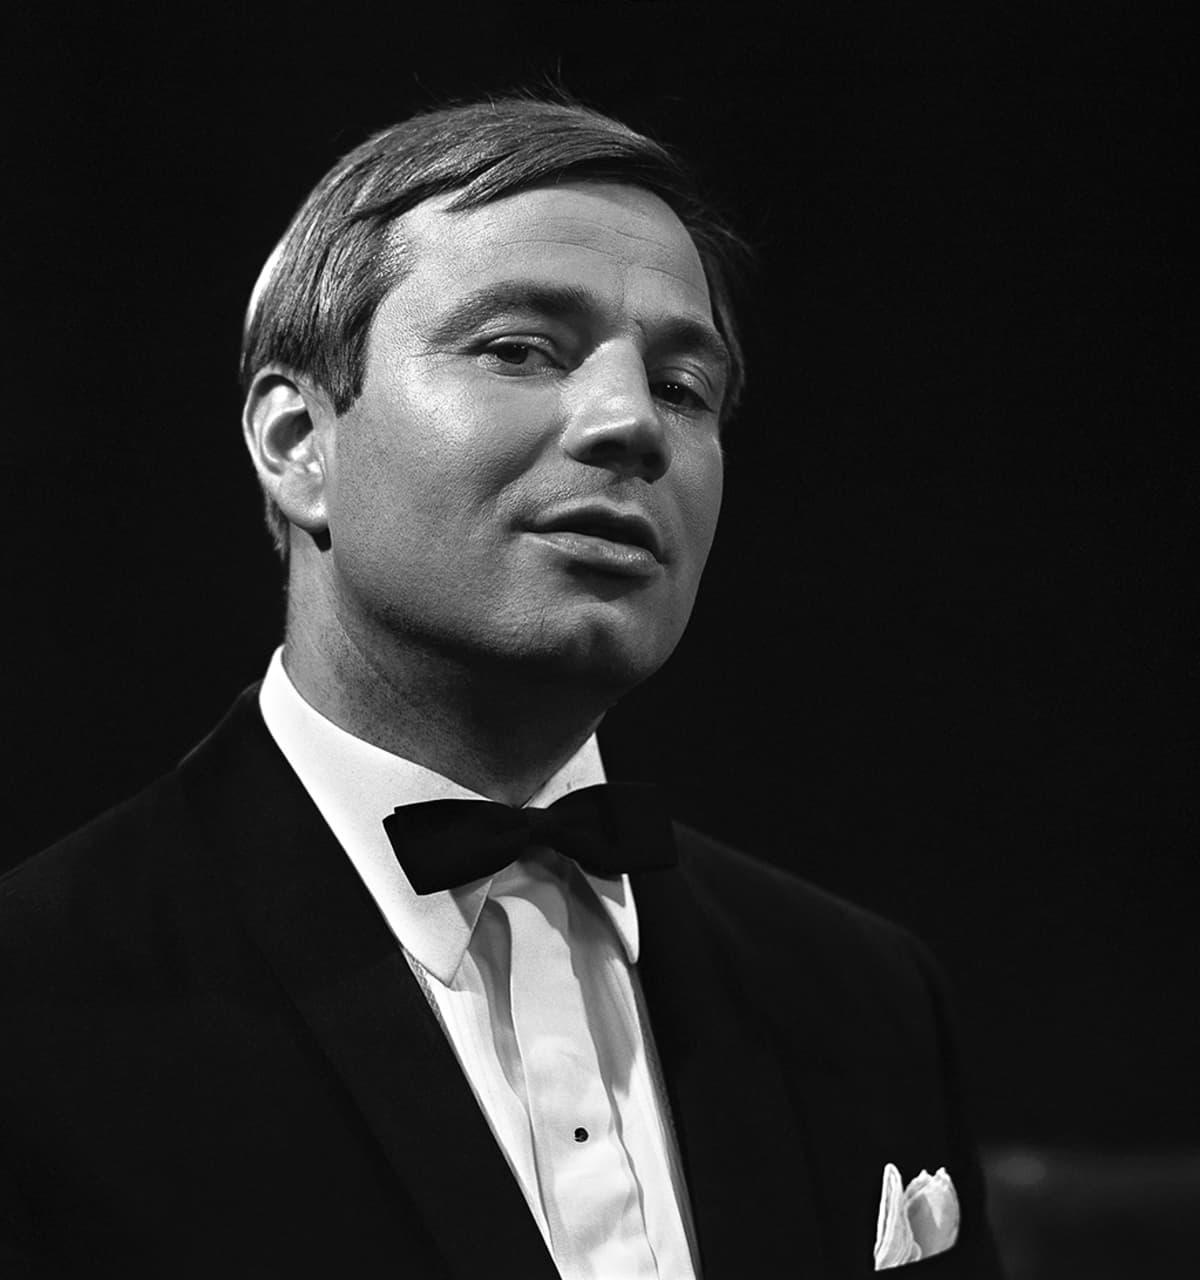 Matti Kuusla